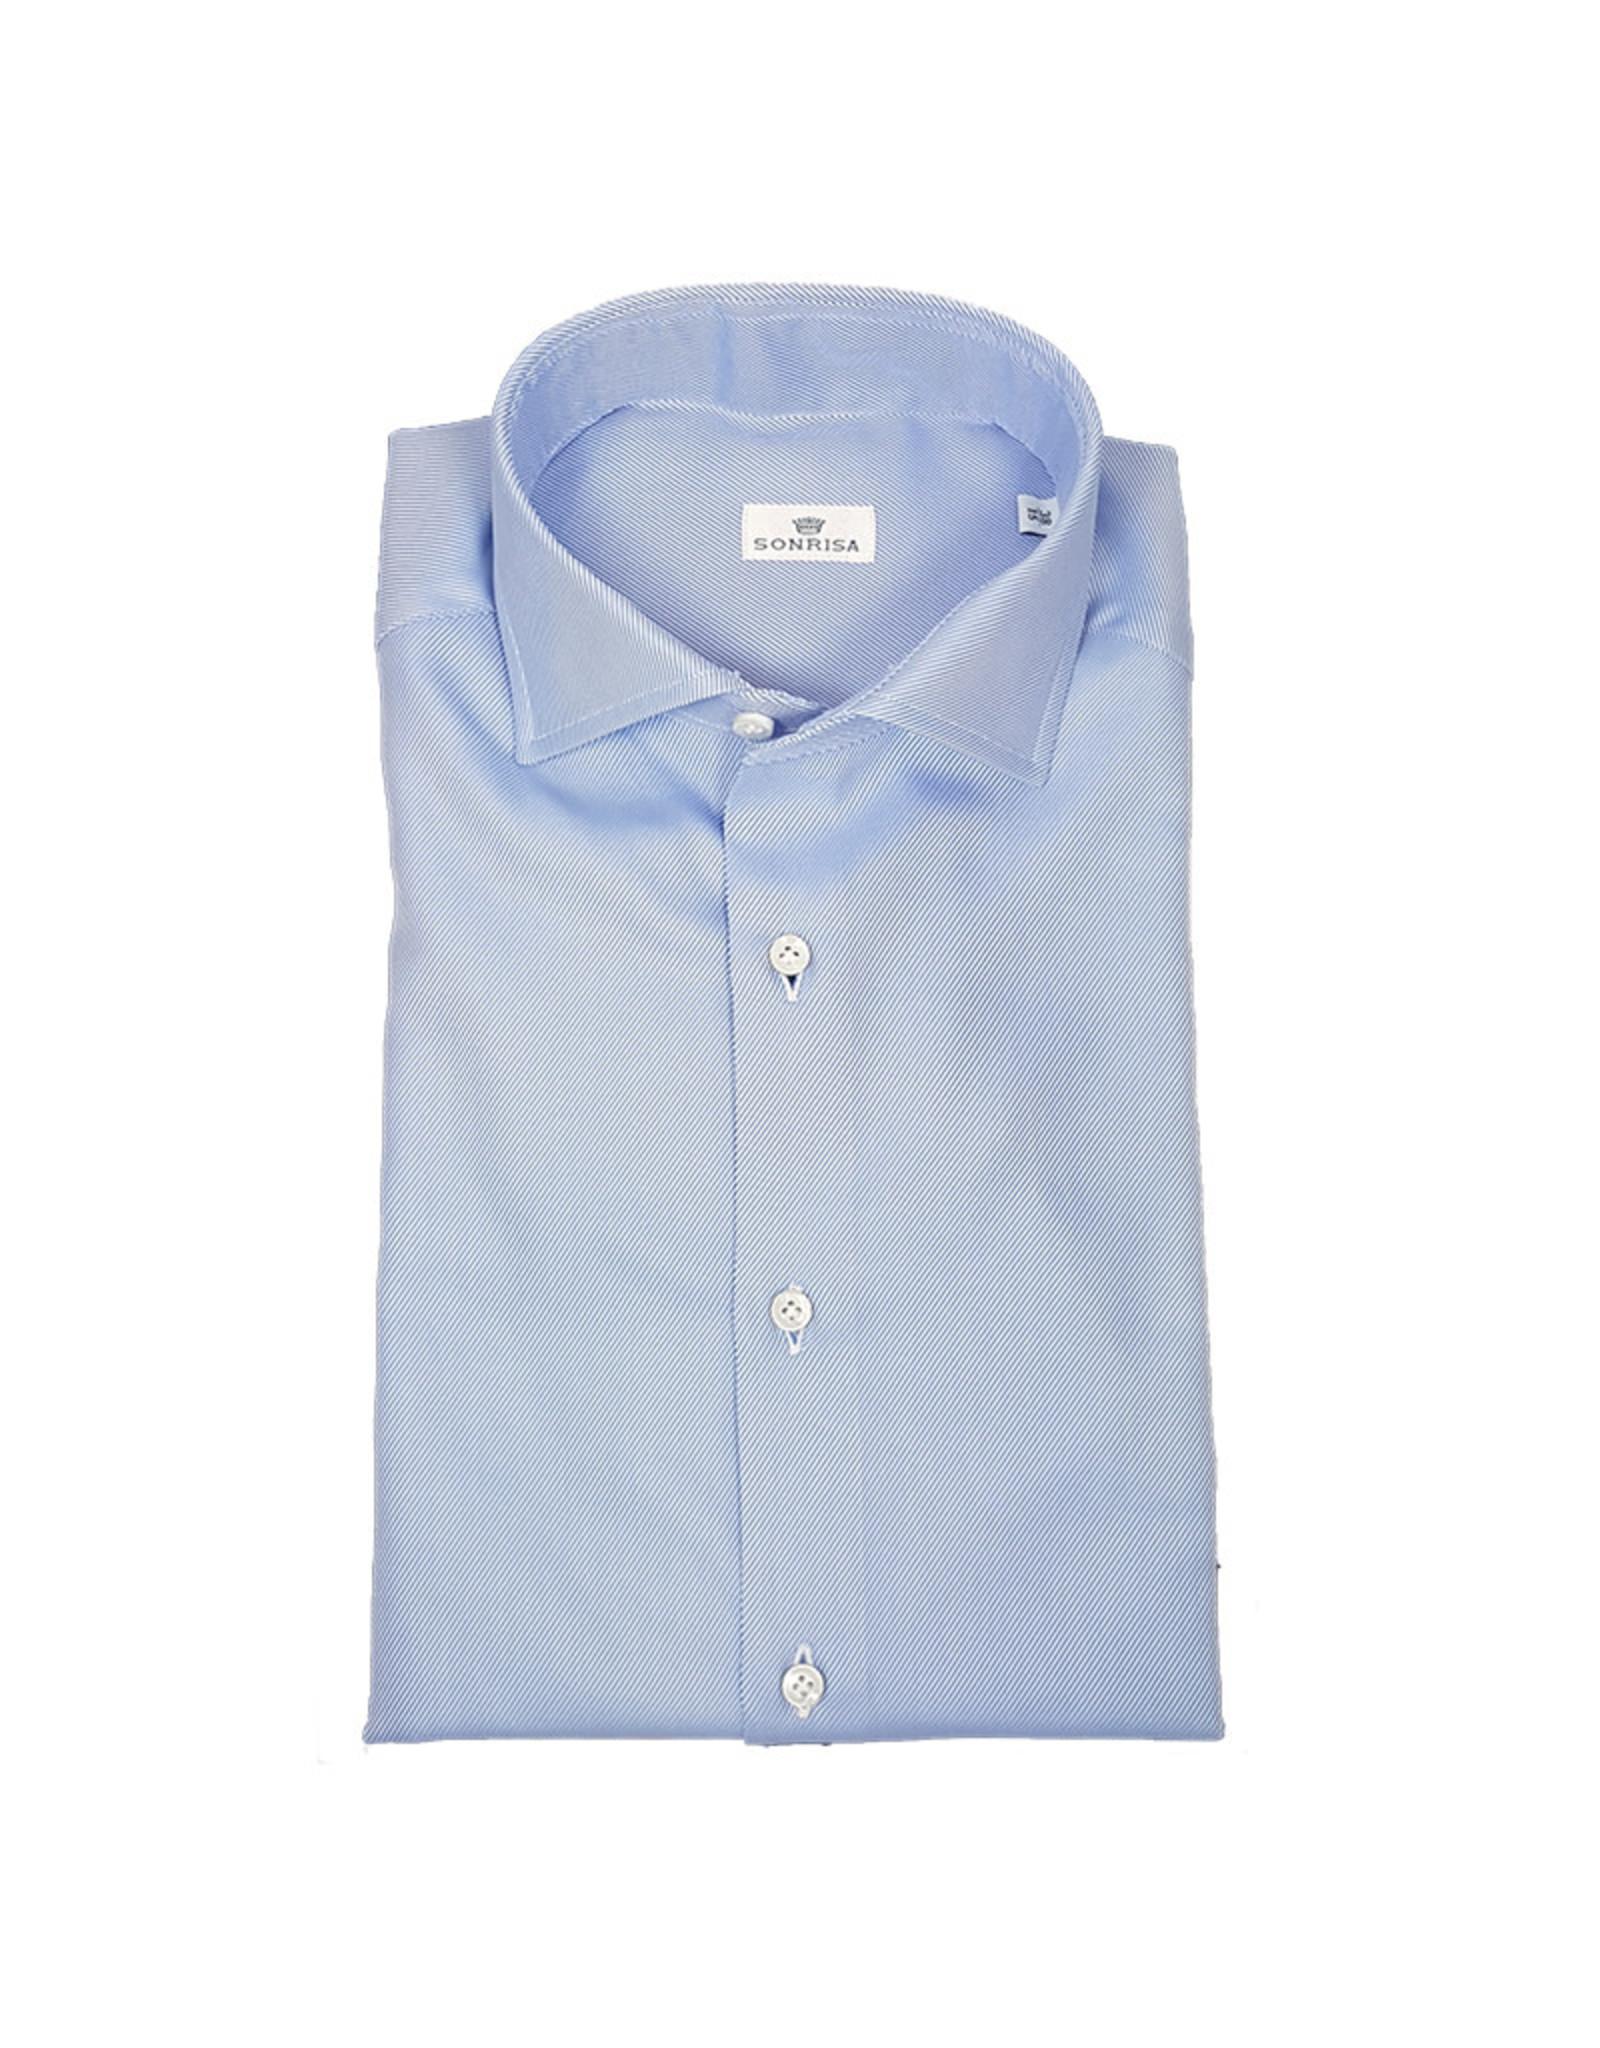 Sonrisa Sonrisa hemd blauw Fitted body L1003/02